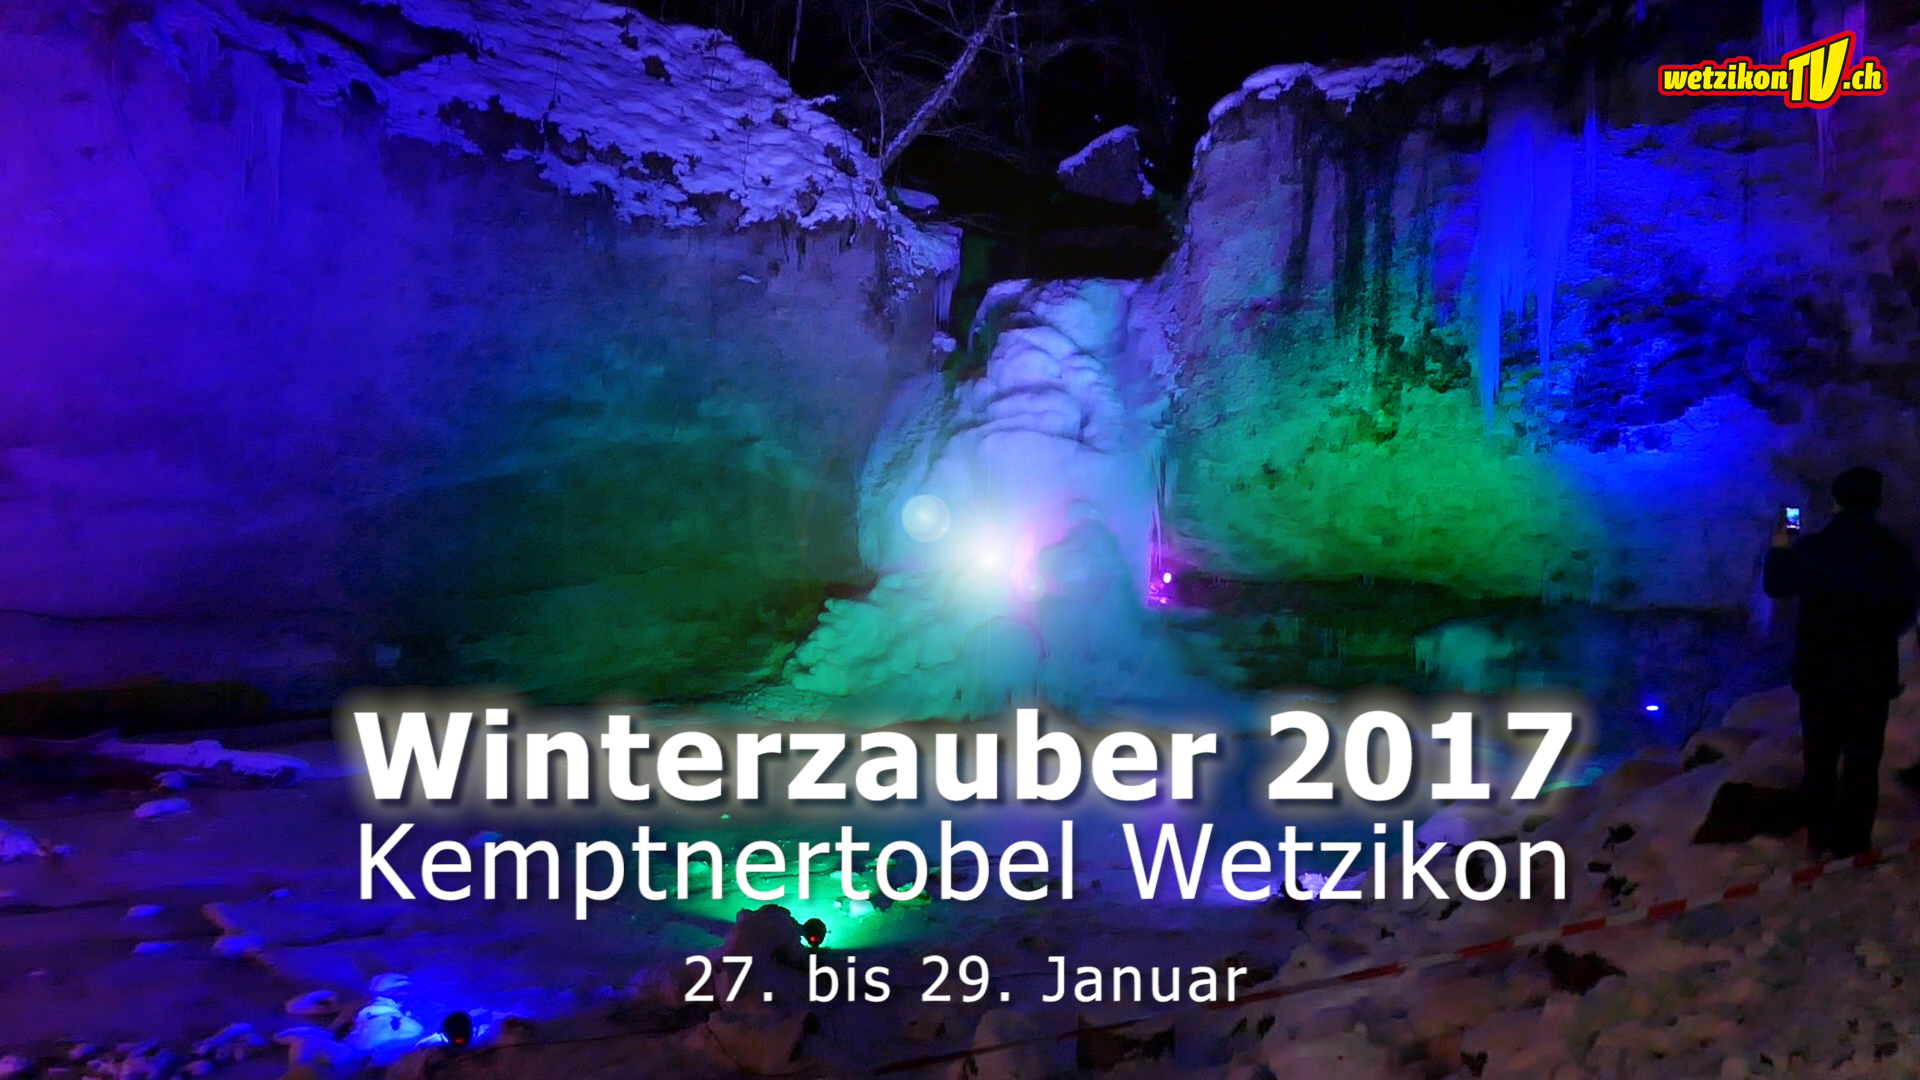 "<a href=""http://www.winterzauber-wetzikon.ch"" target=""_blank"">www.winterzauber-wetzikon.ch</a>"